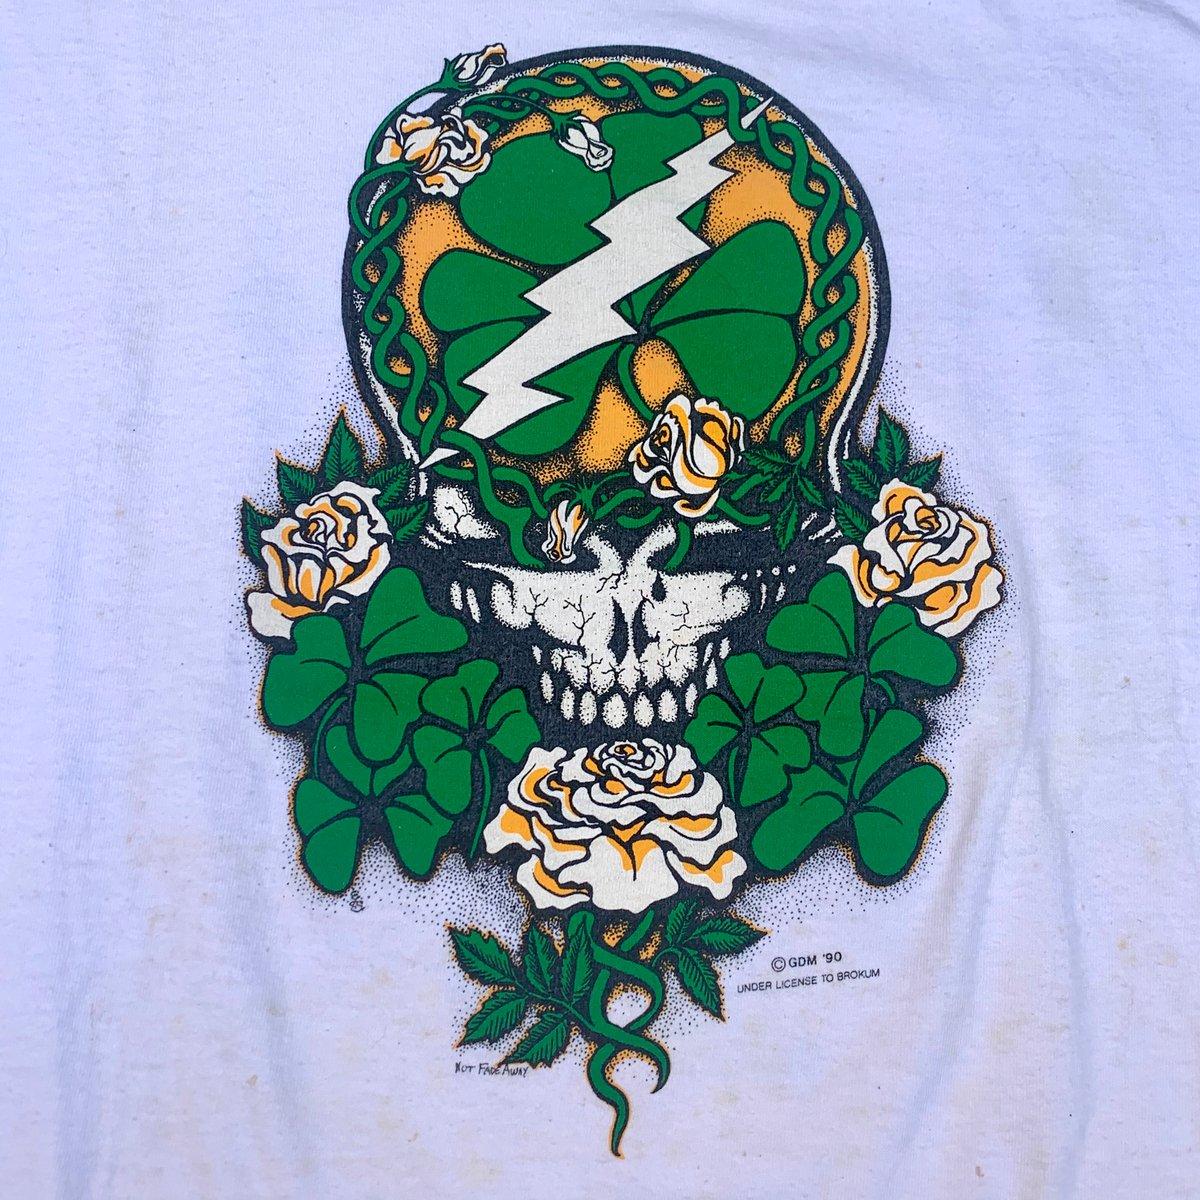 ORIGINAL VINTAGE GRATEFUL DEAD Spring Tour 1992!! XXL